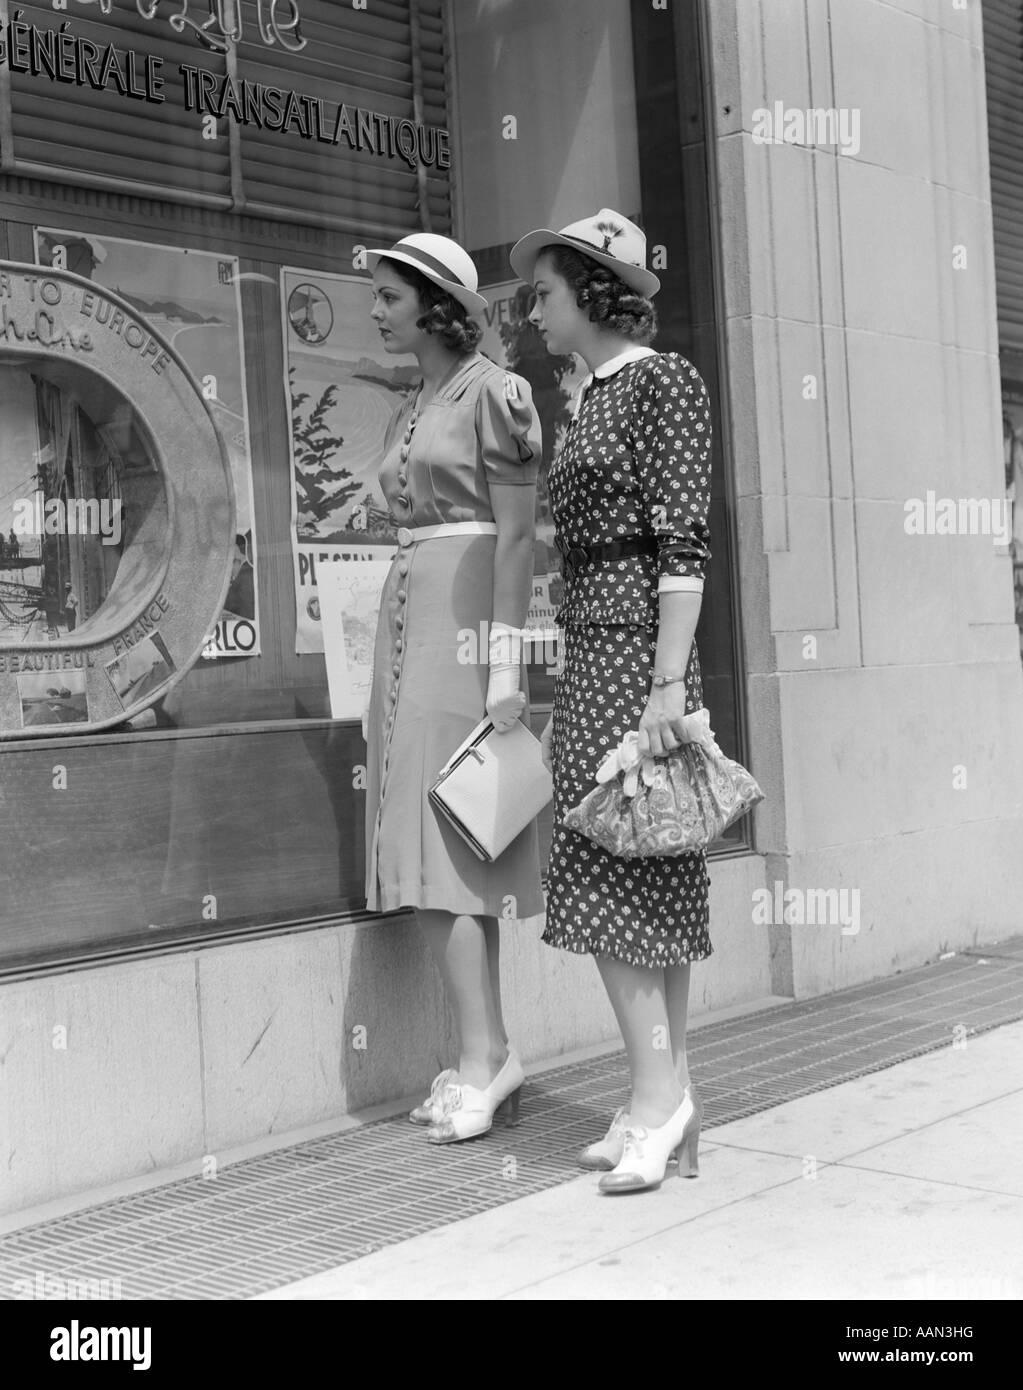 1930s TWO YOUNG WOMEN WINDOW SHOPPING - Stock Image